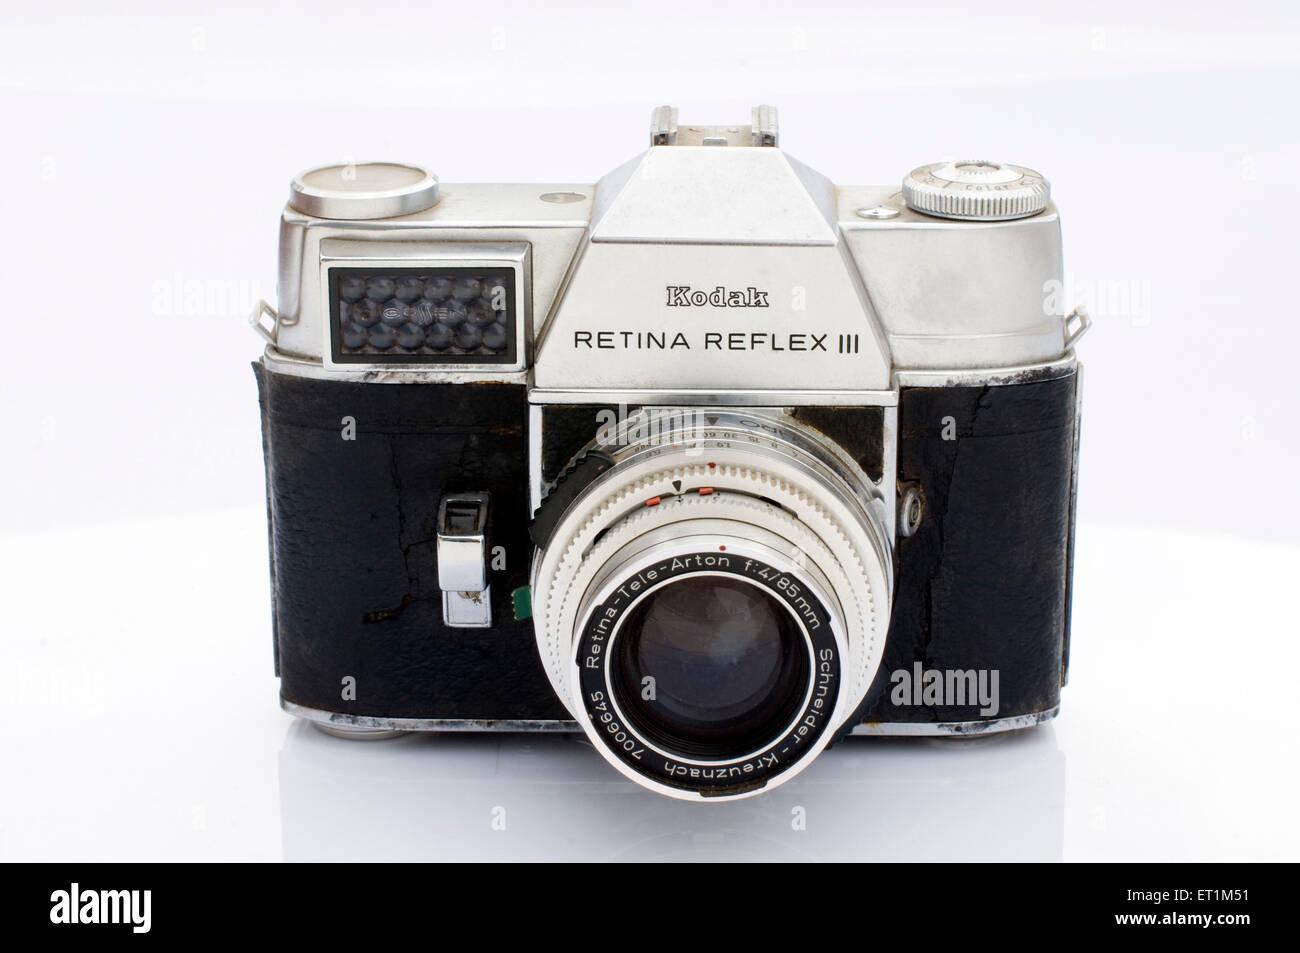 Kodak Retina Reflex III film camera Pune Maharashtra India Asia - Stock Image